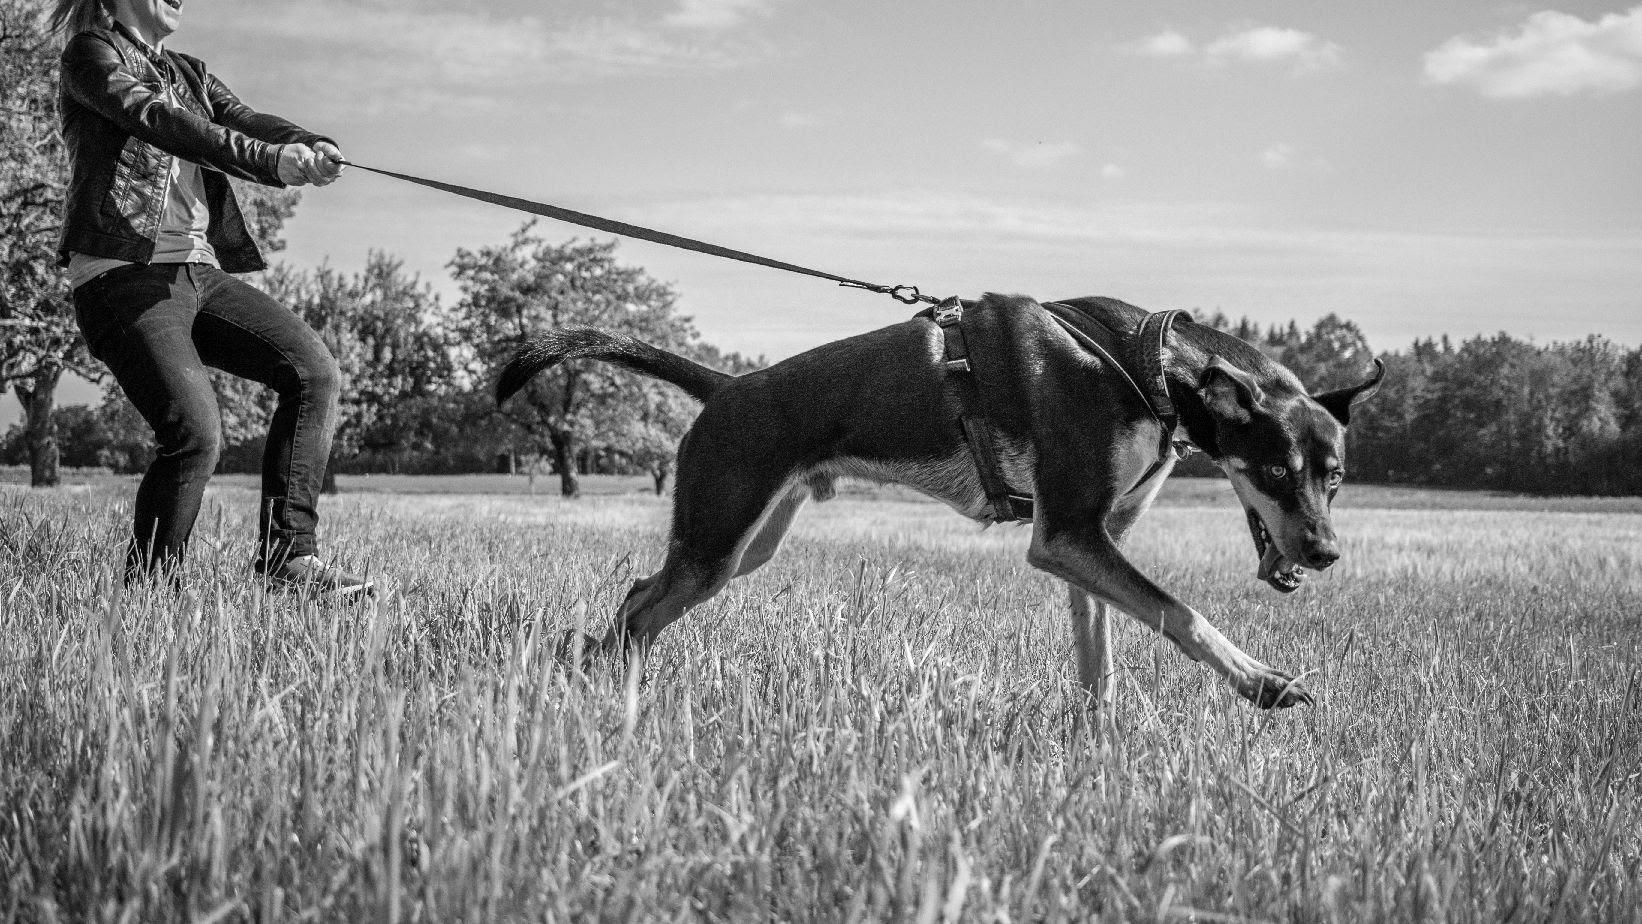 LakeDog Hundeschule Entspannt an der Leine